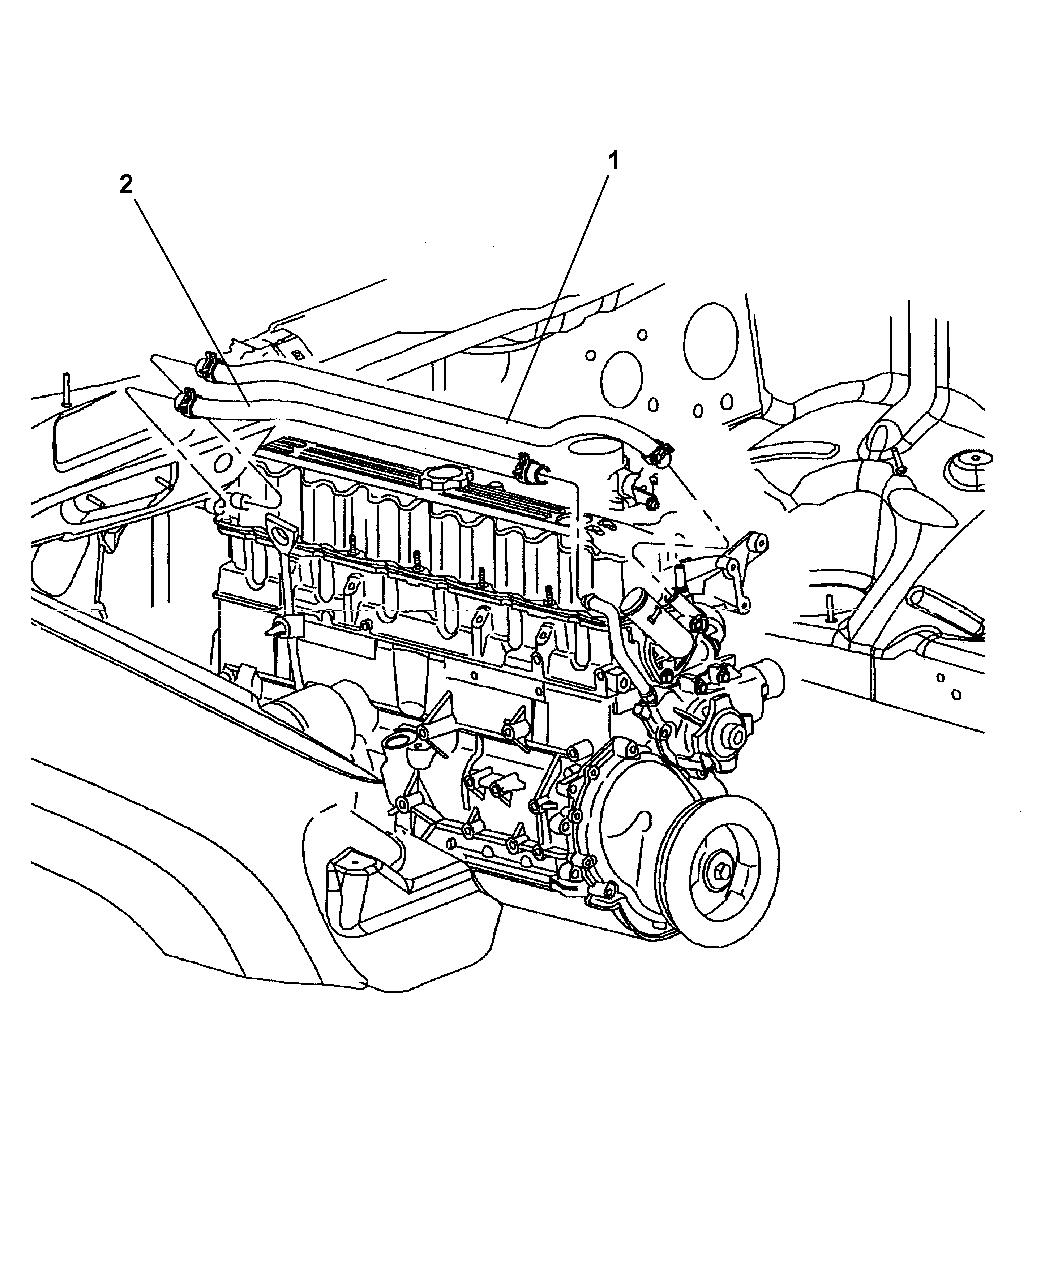 2004 jeep grand cherokee heater hoses mopar parts giant 2004 Jeep Grand Cherokee Fan Relay Location